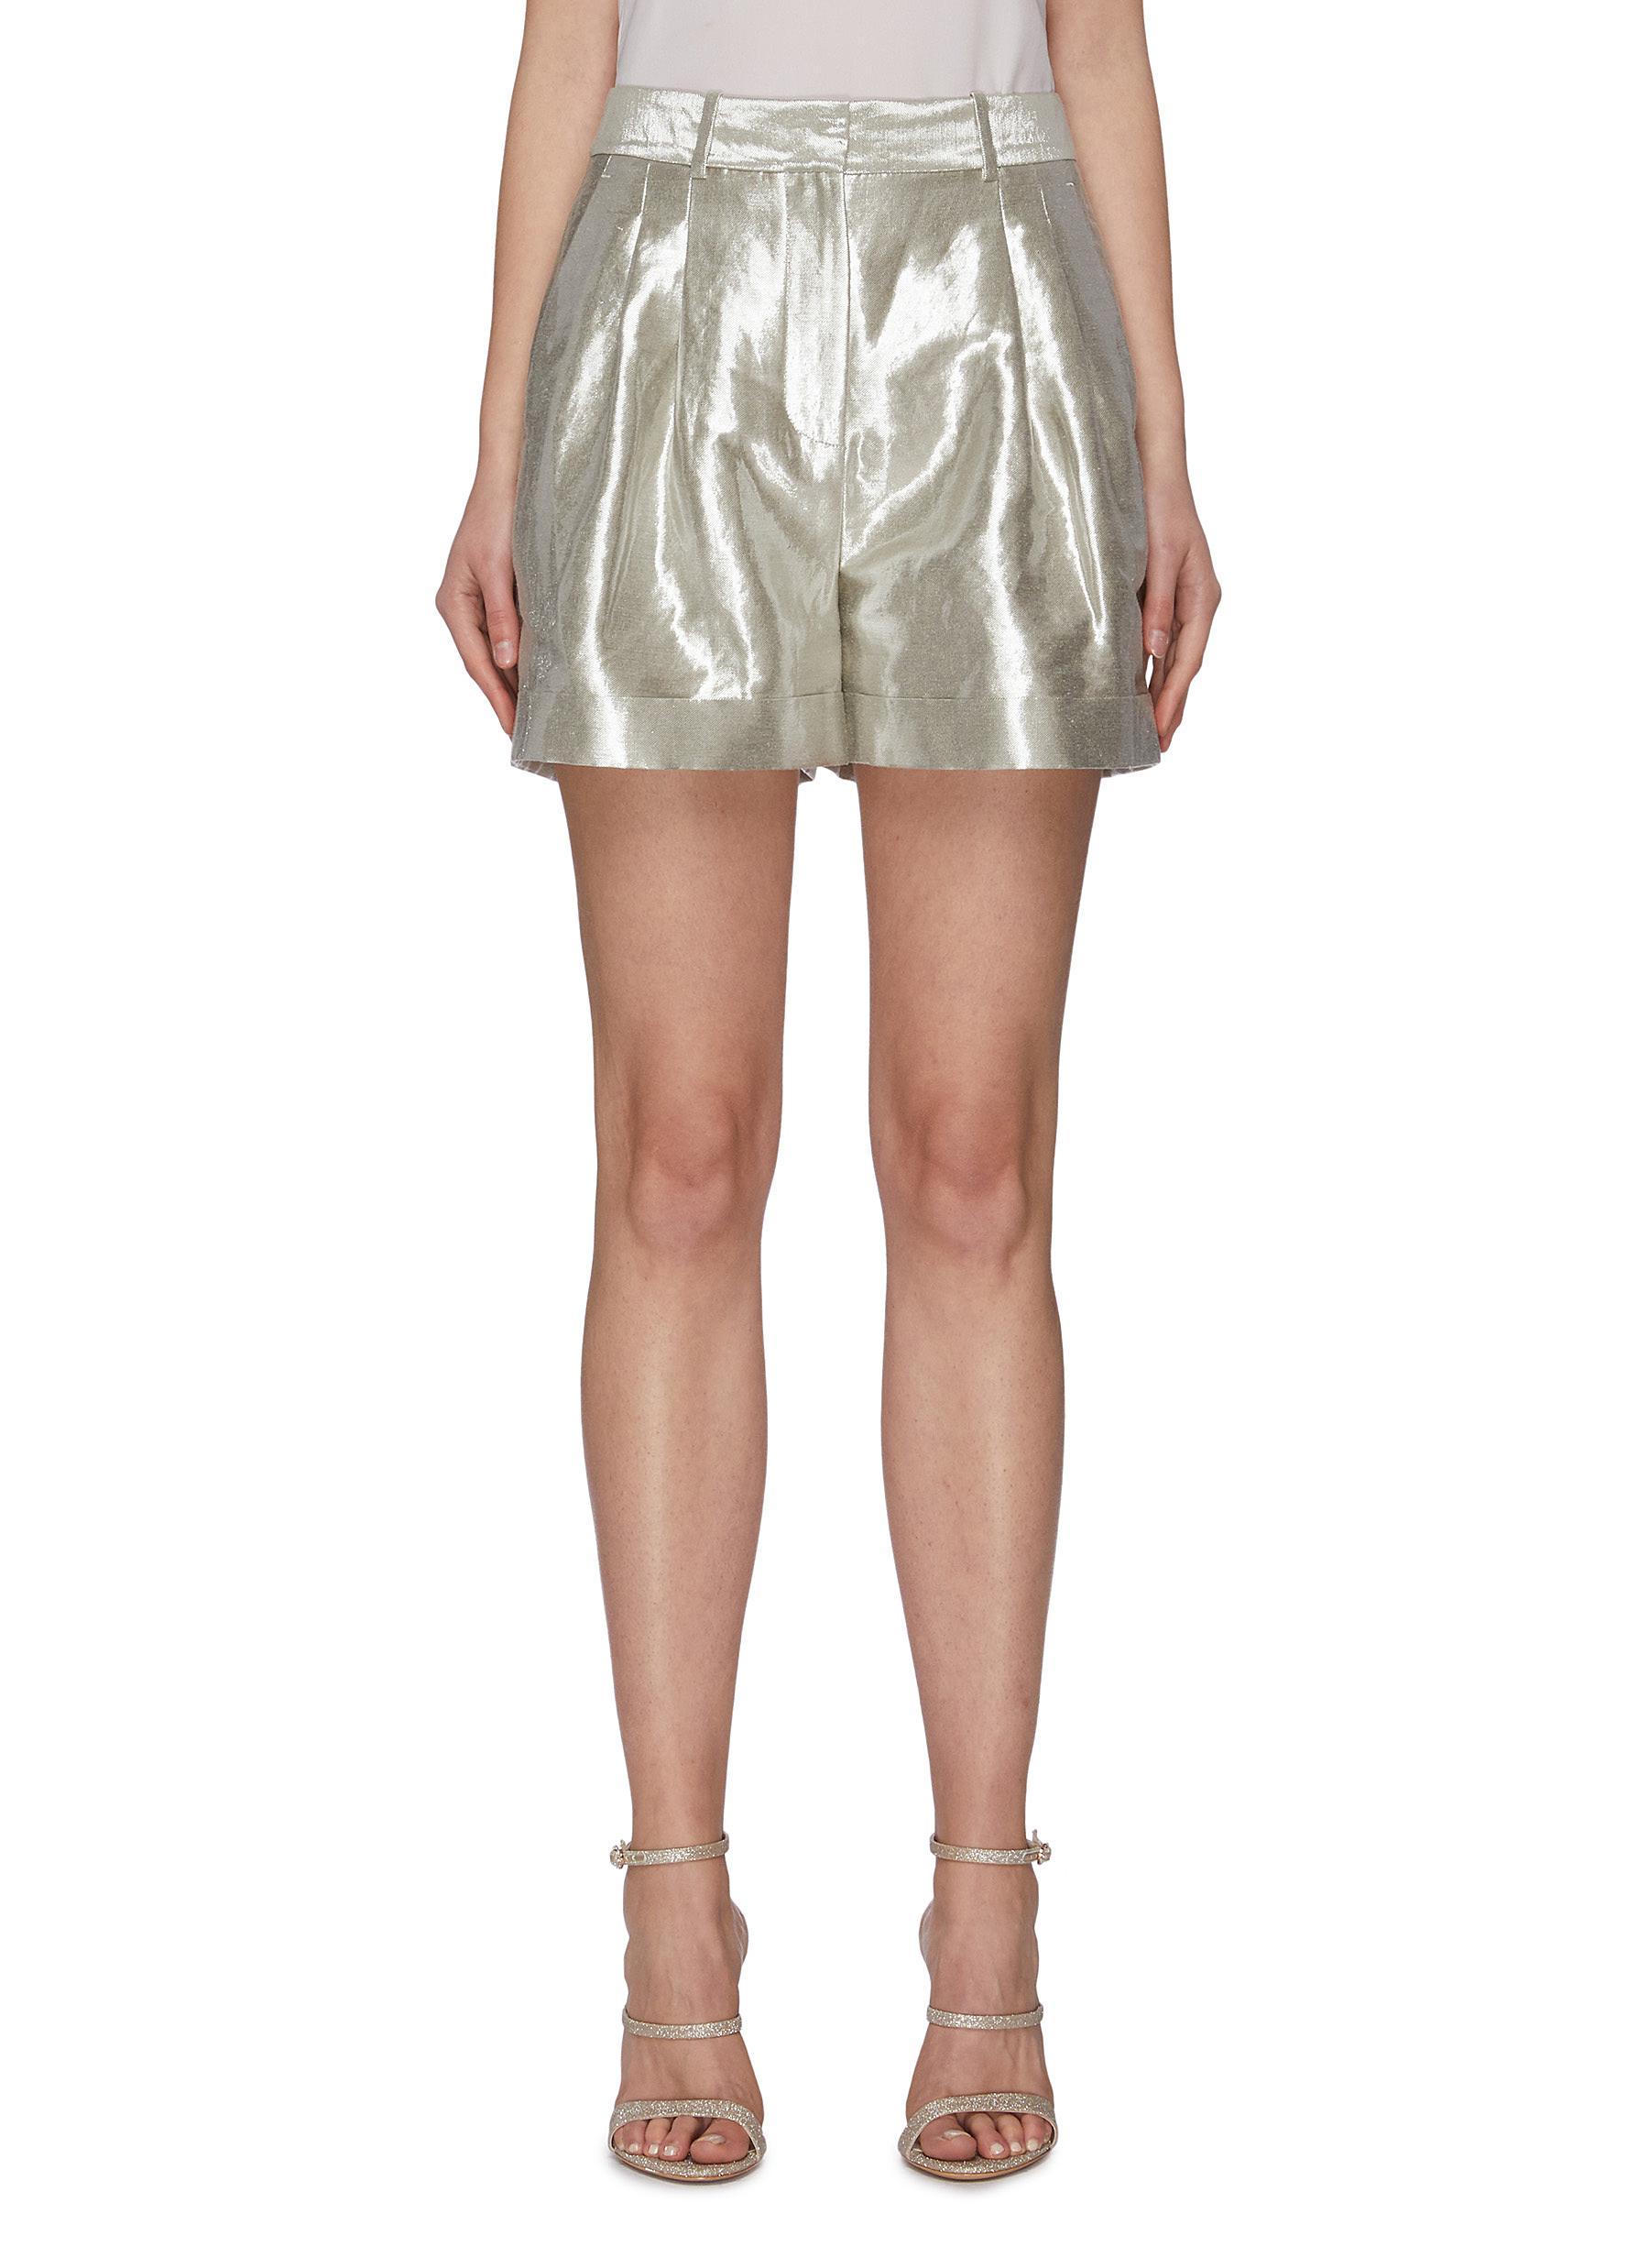 Buy Racil Pants & Shorts 'City' metallic shorts